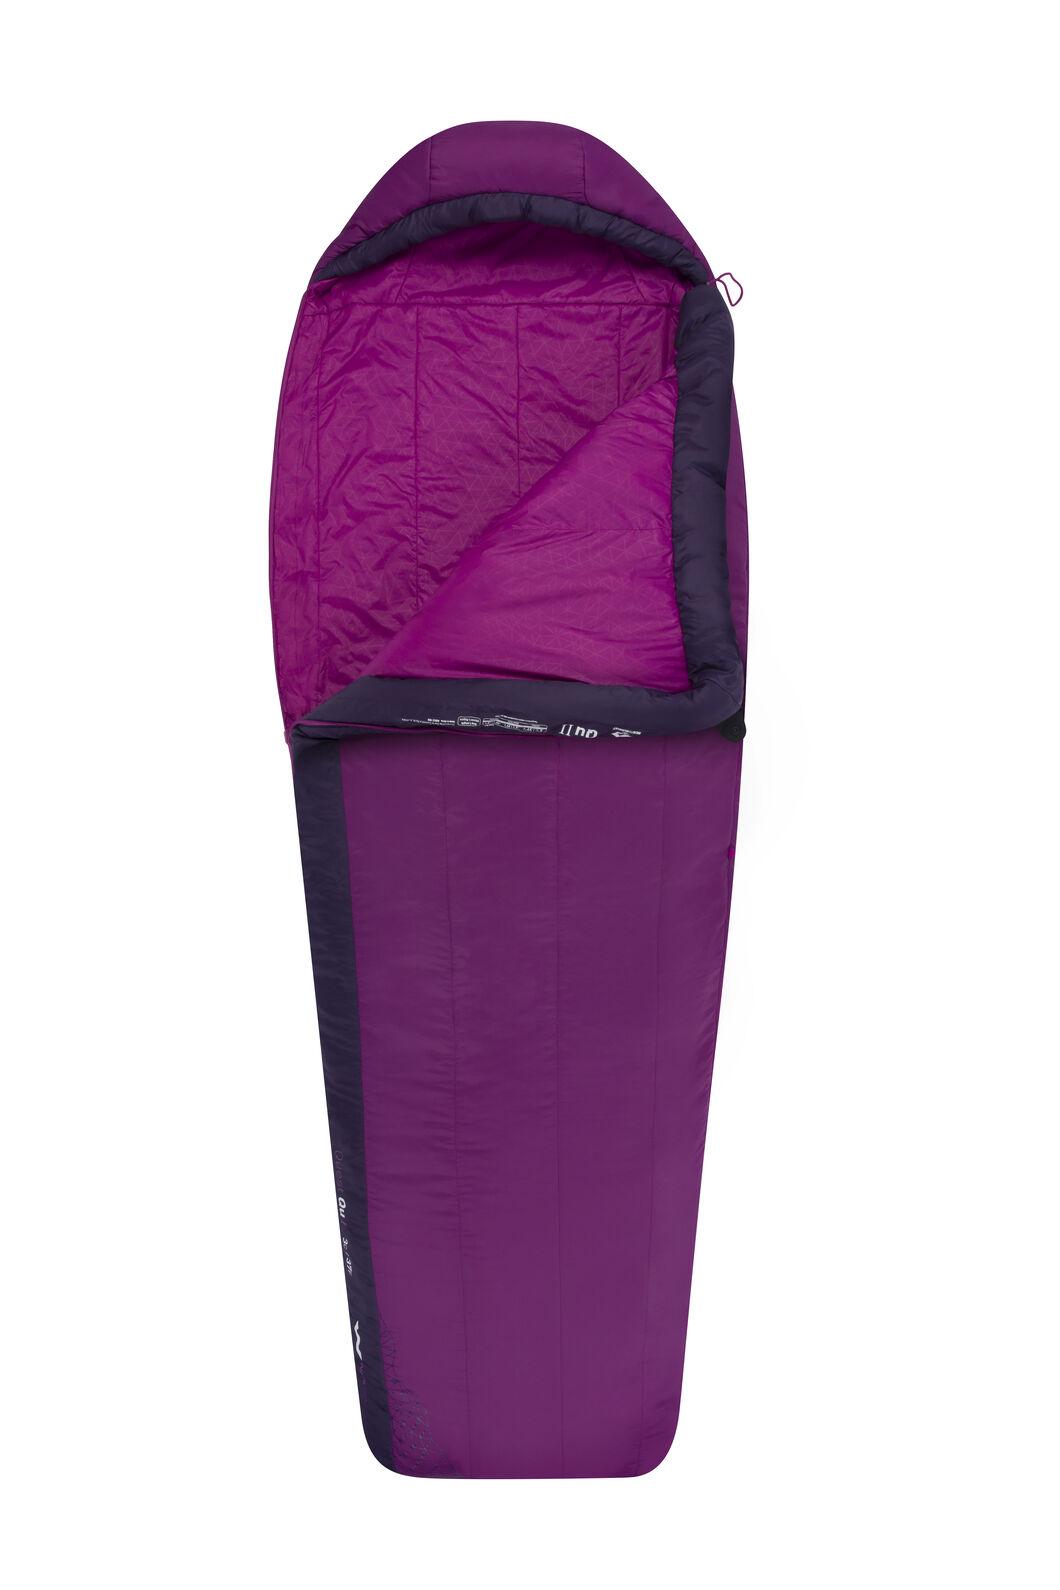 Sea to Summit Quest I Sleeping Bag - Women's Long, Purple, hi-res